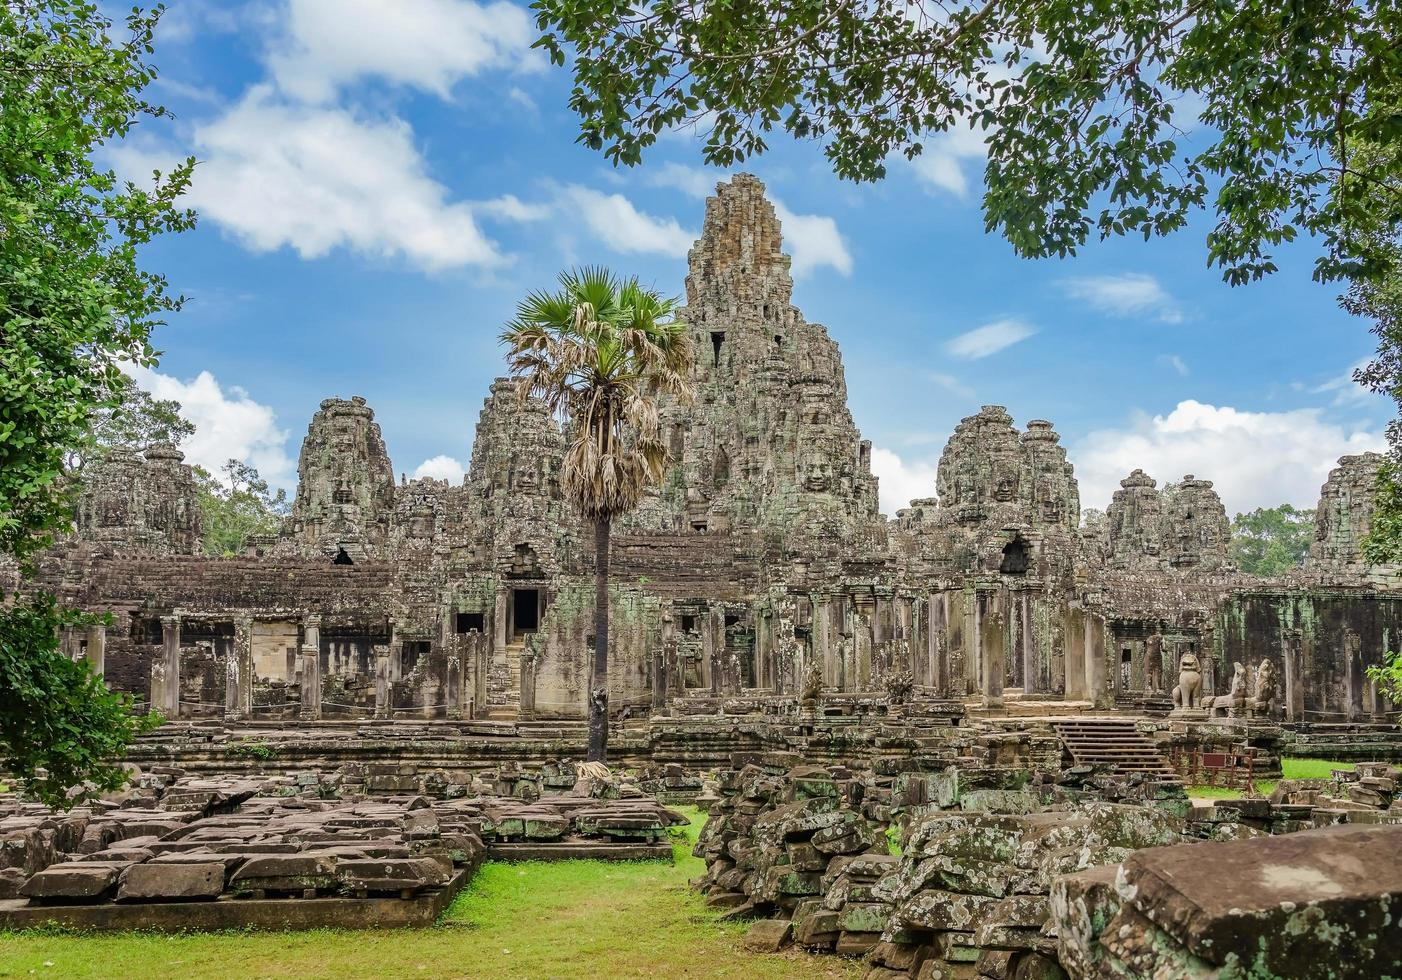 alter Tempel Bajon Angkor Komplex, Siem Reap, Kambodscha foto